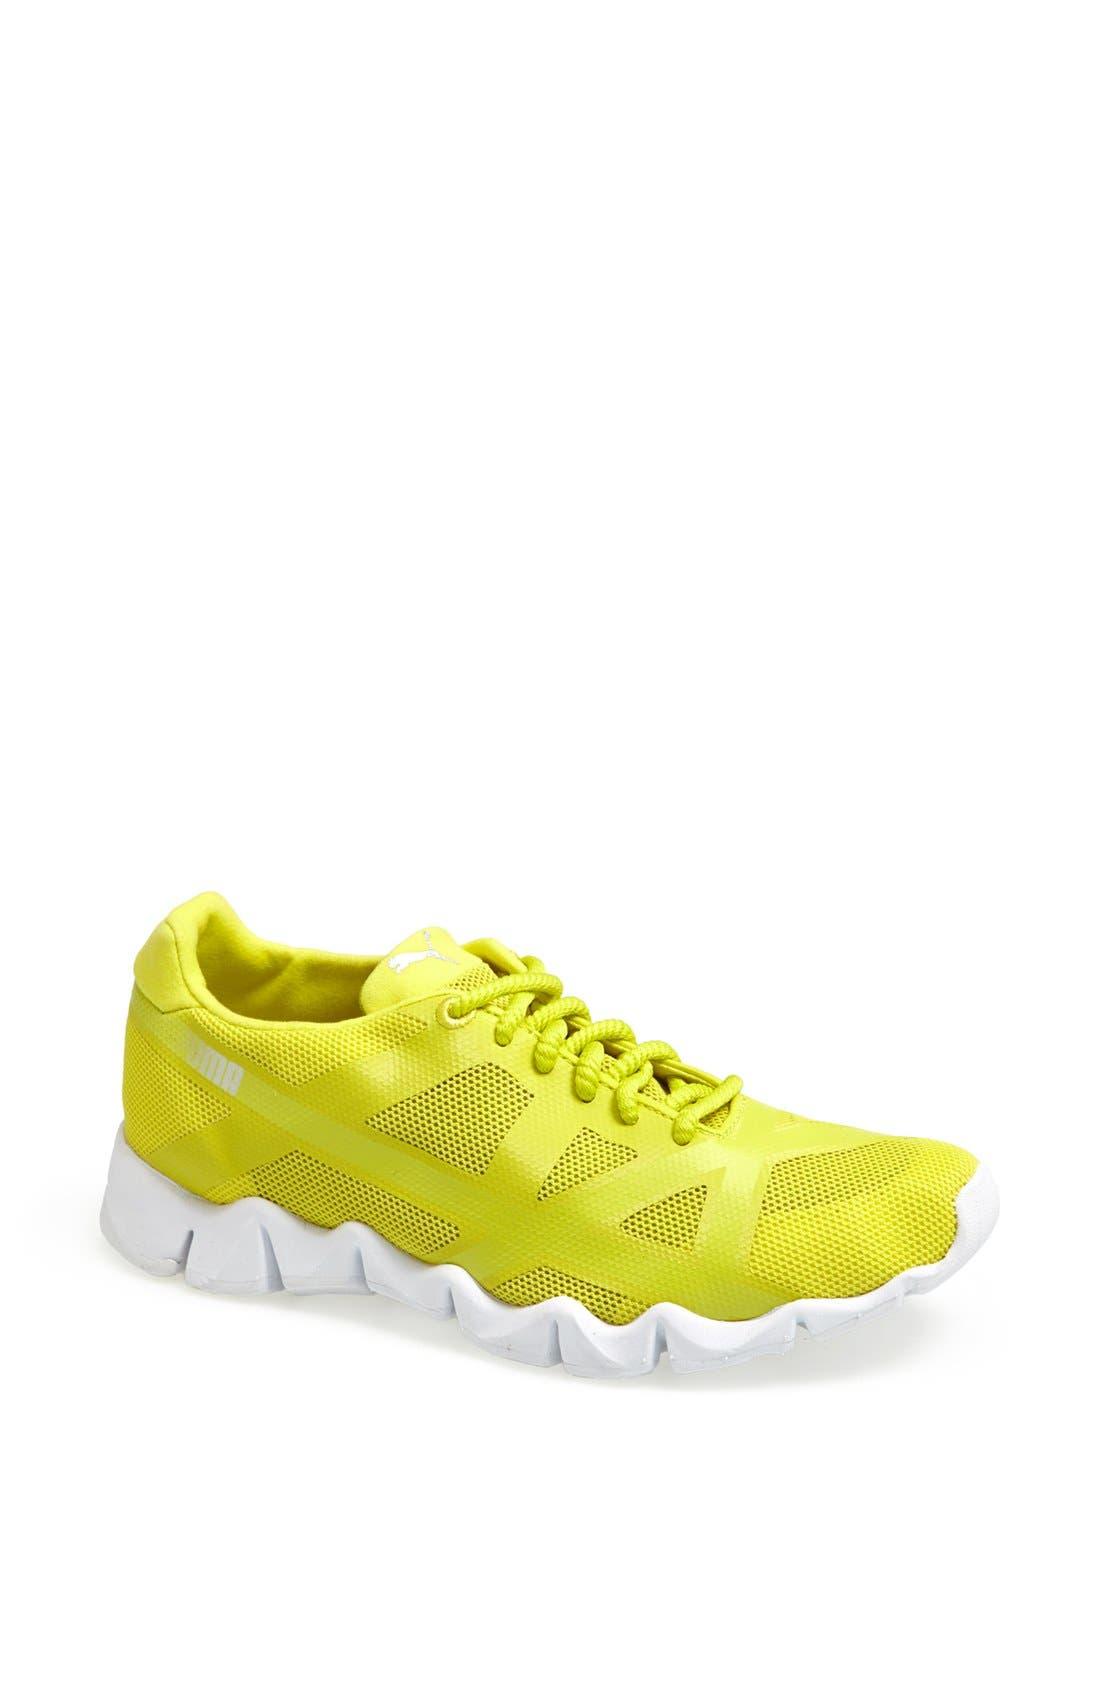 Alternate Image 1 Selected - PUMA 'Axel' Sneaker (Women)